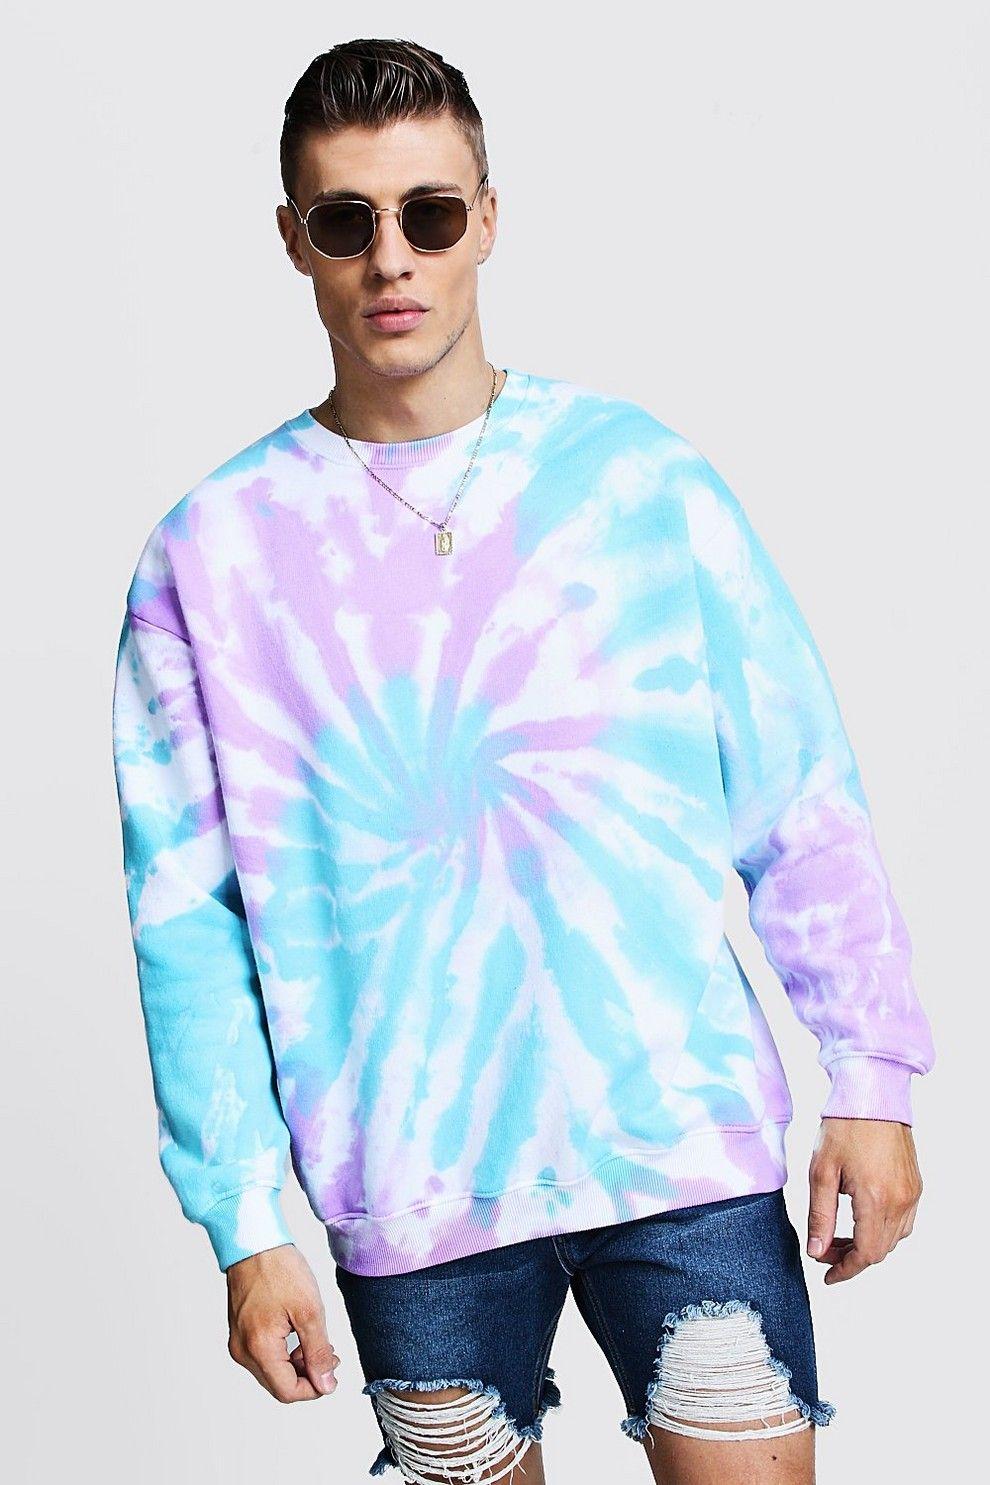 Tie Dye Oversized Sweatshirt Boohooman Moda Tie Dye Como Fazer Roupas Roupas Tie Dye [ 1485 x 990 Pixel ]